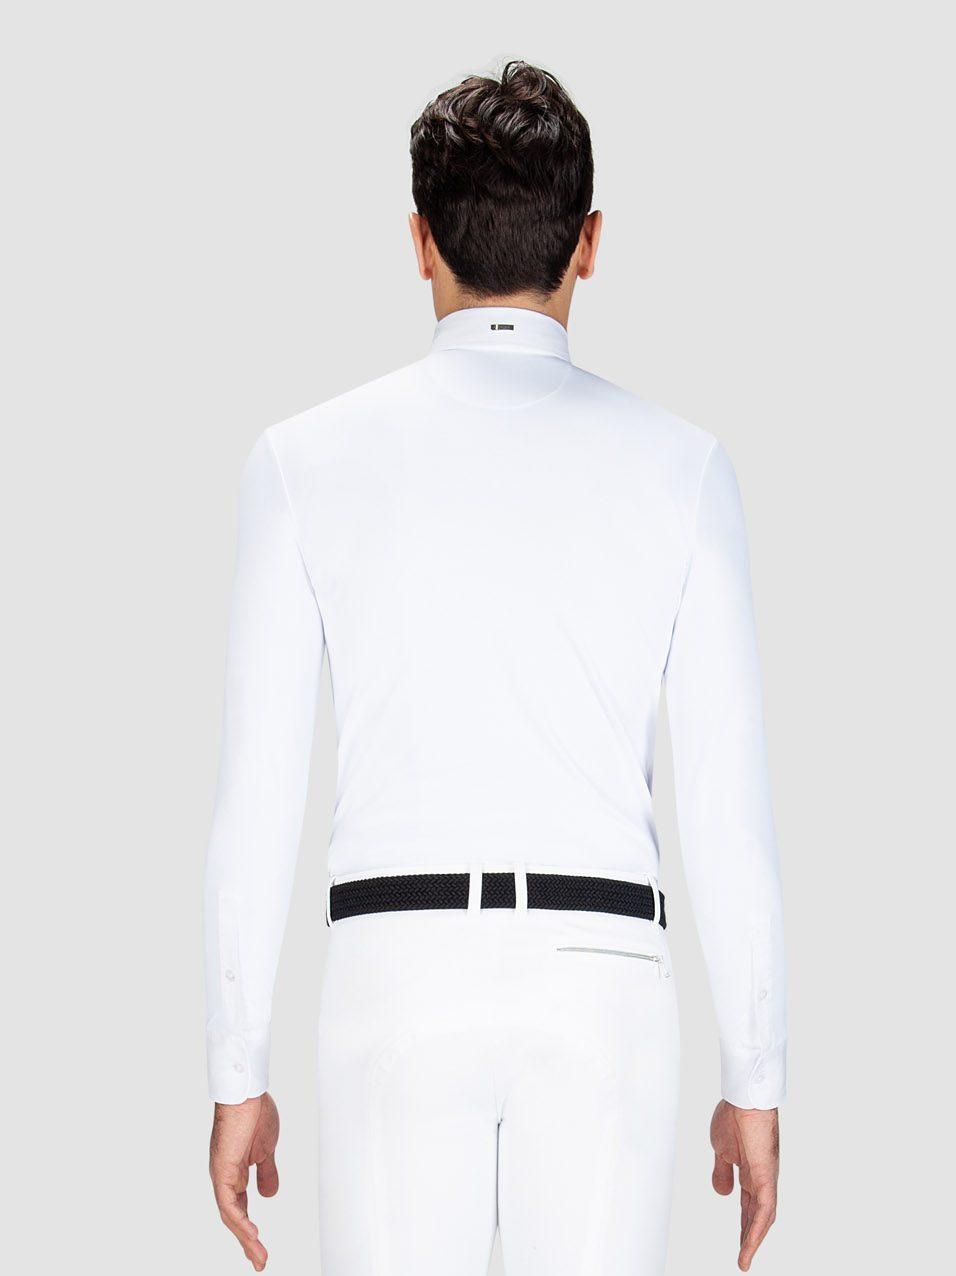 DAVID - Men's Long Sleeve Show Shirt 1